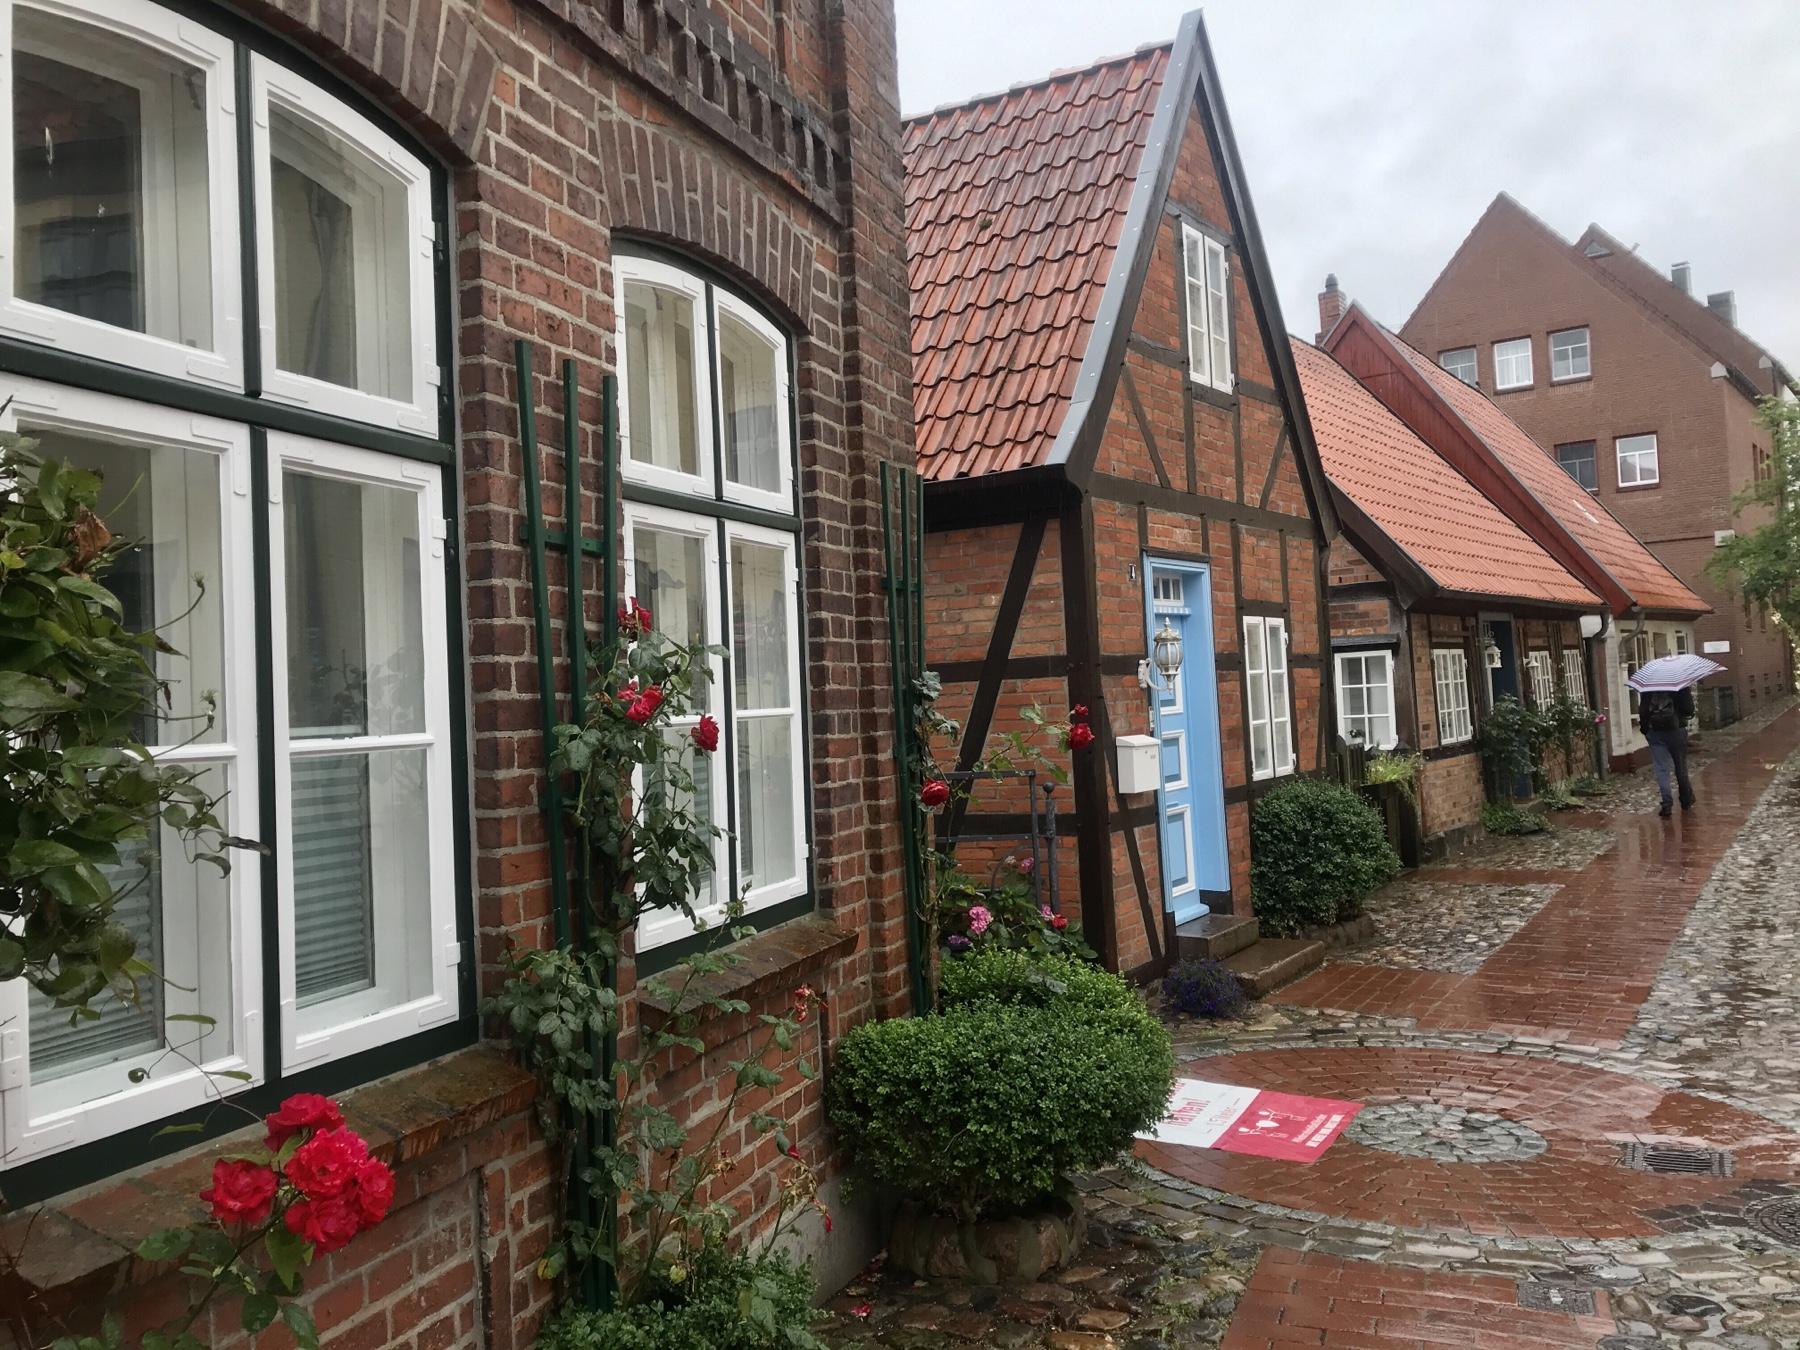 Heiligen Geist Viertel in Bad Oldesloe, Stormarnweg Etappe 5 nach Reinfeld